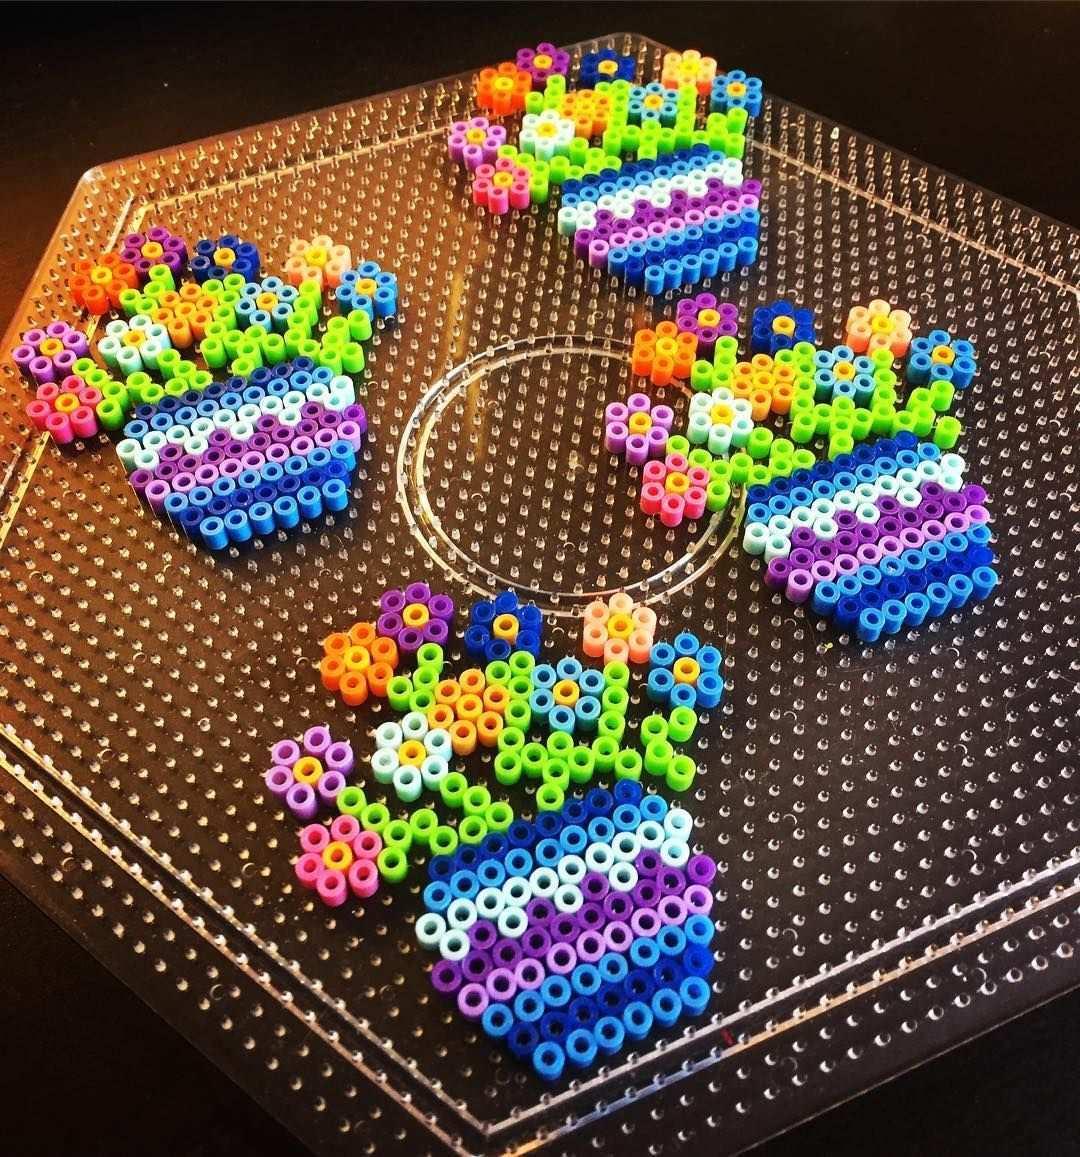 Flowers Mini Perler Beads By Perlermom Perler Bead Templates Hama Beads Patterns Diy Perler Beads